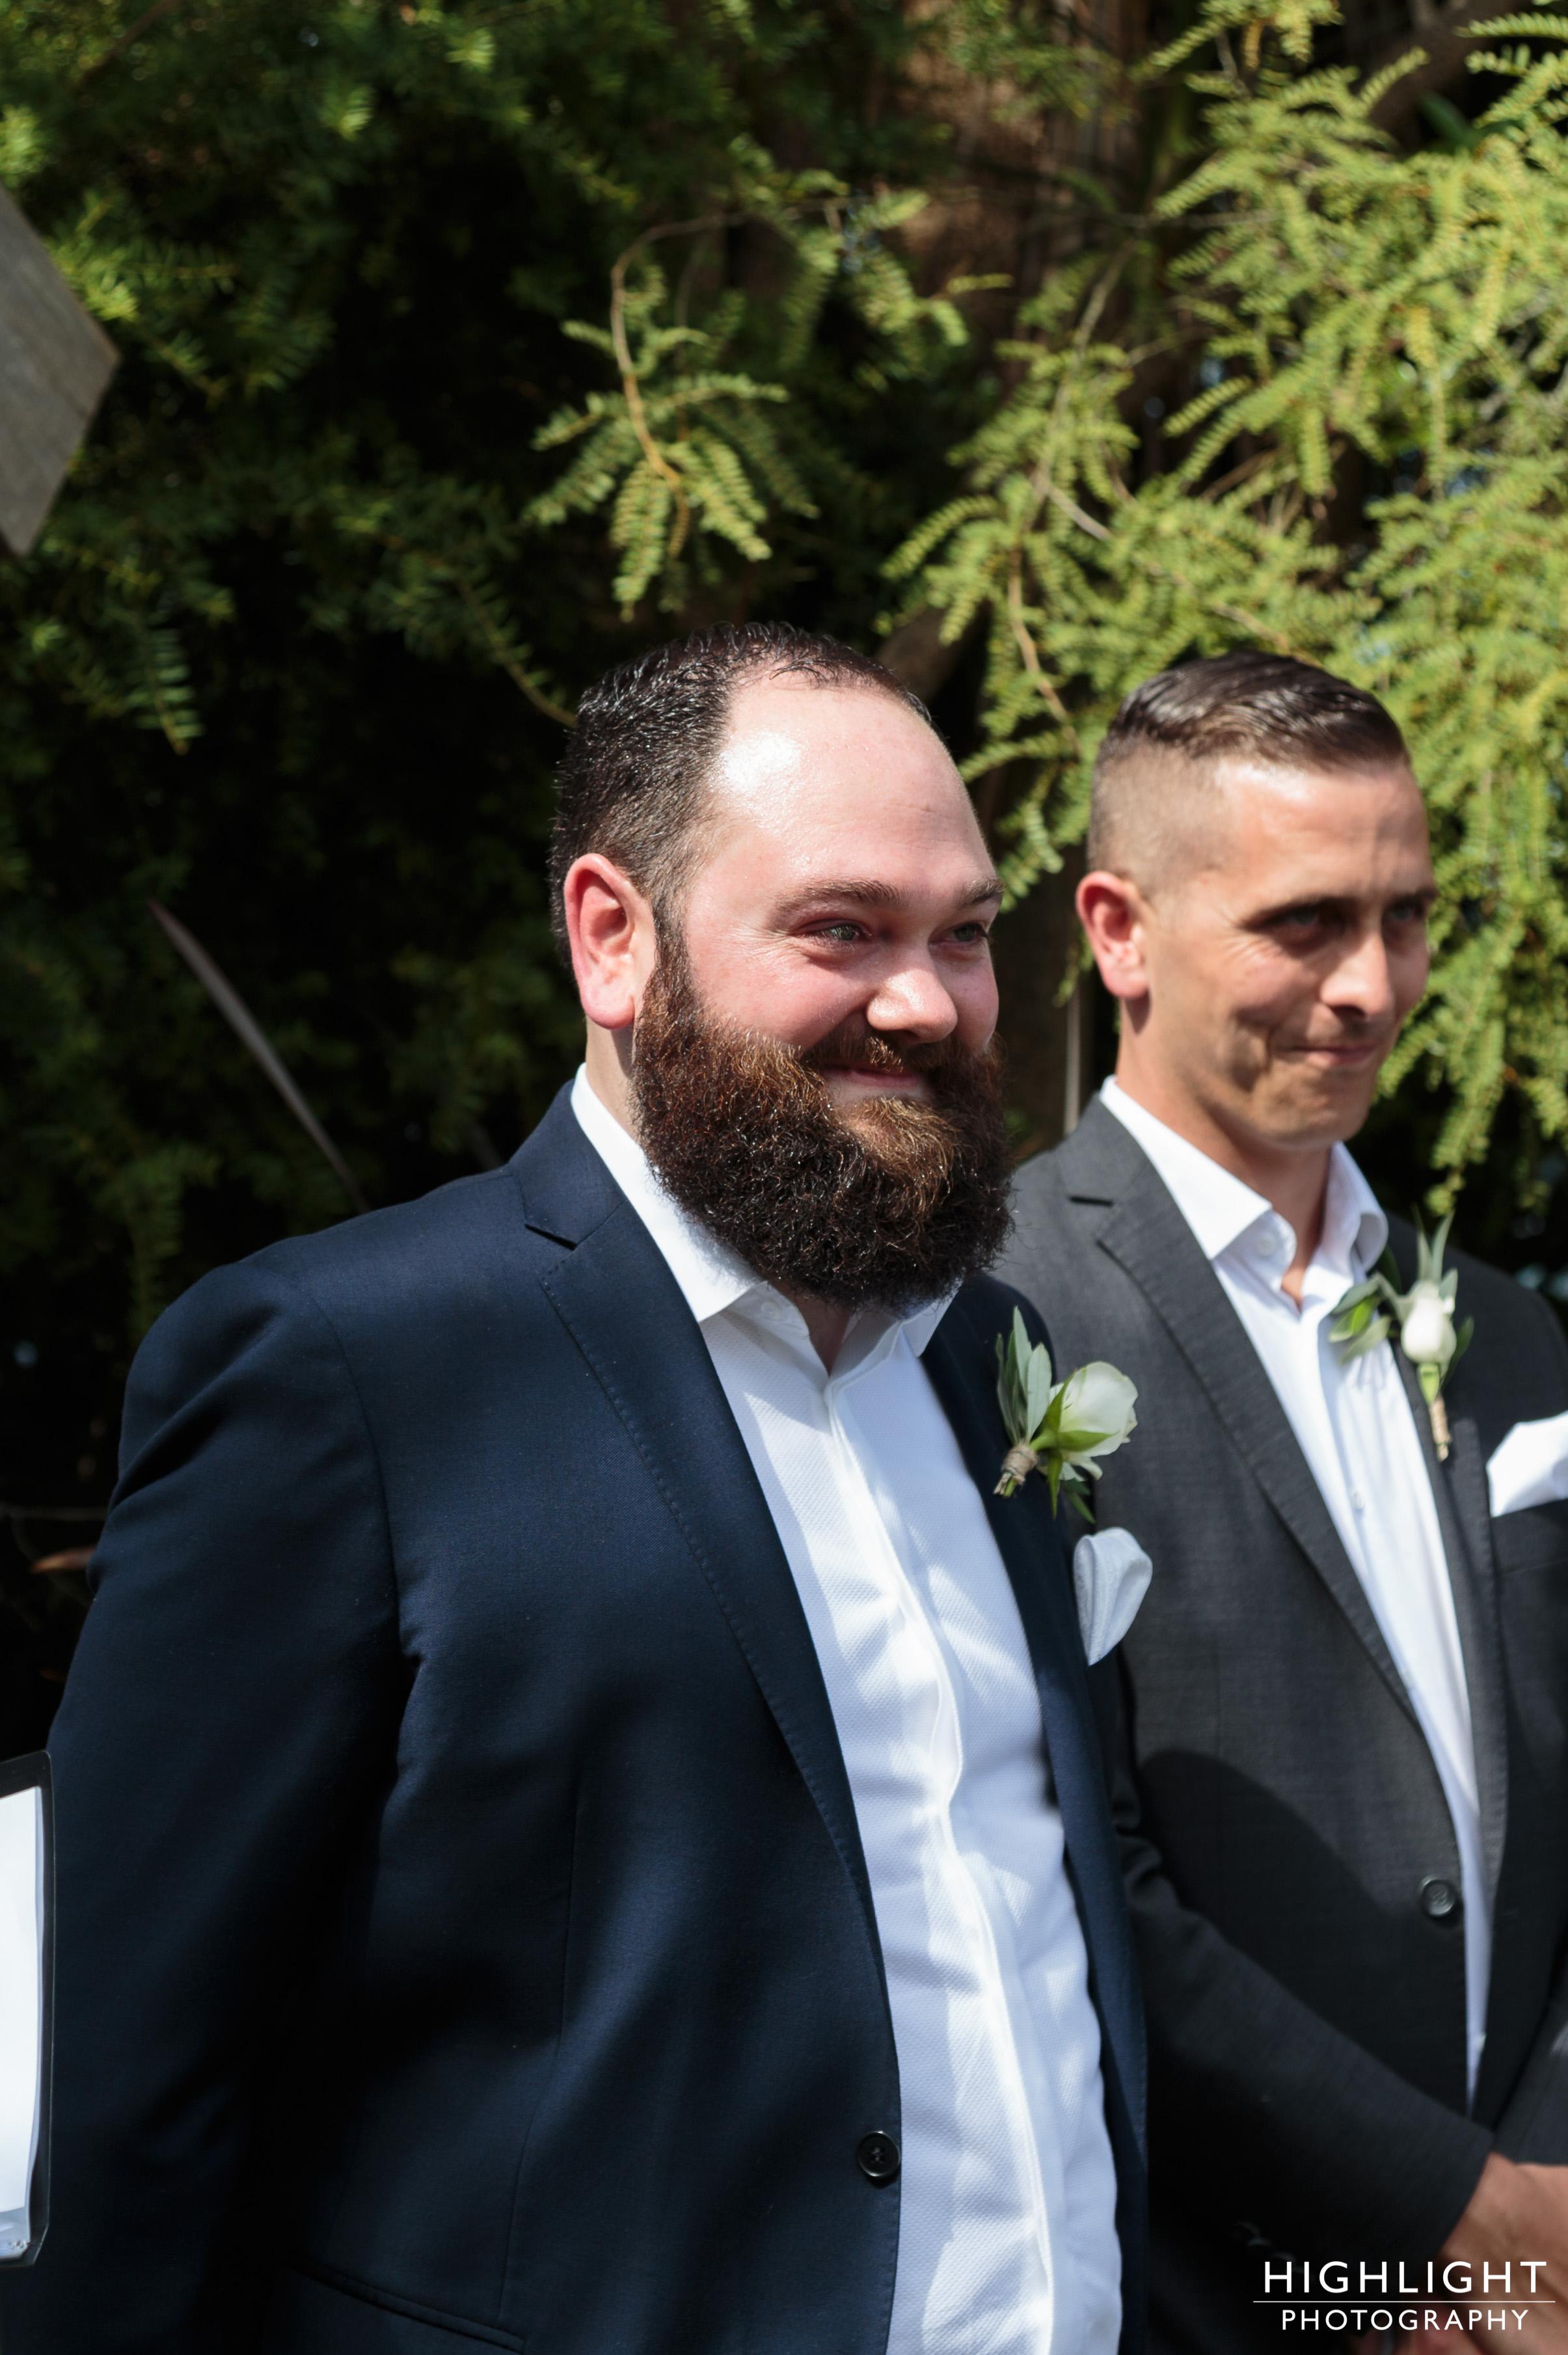 highlight-wedding-photography-new-zealand-makoura-lodge-wedding-58.jpg